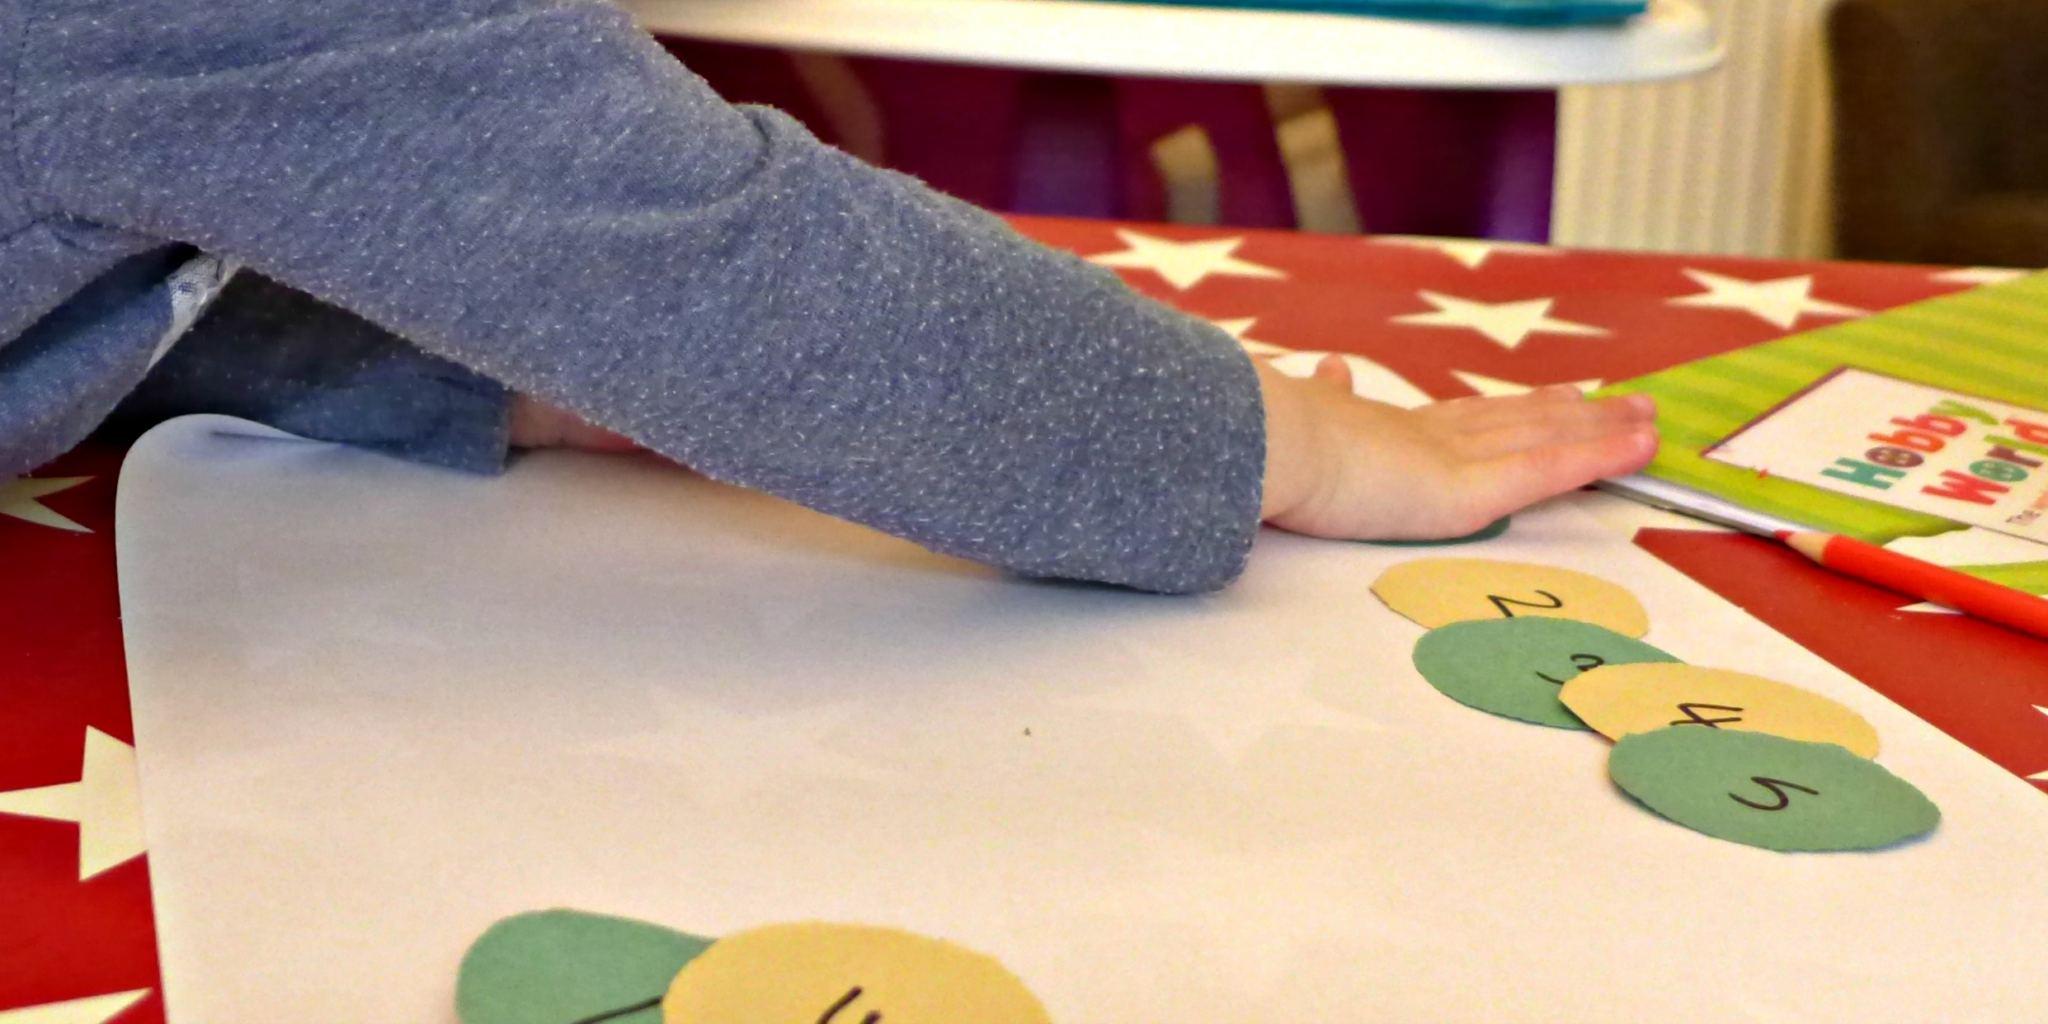 Fun number bond activity for pre schoolers